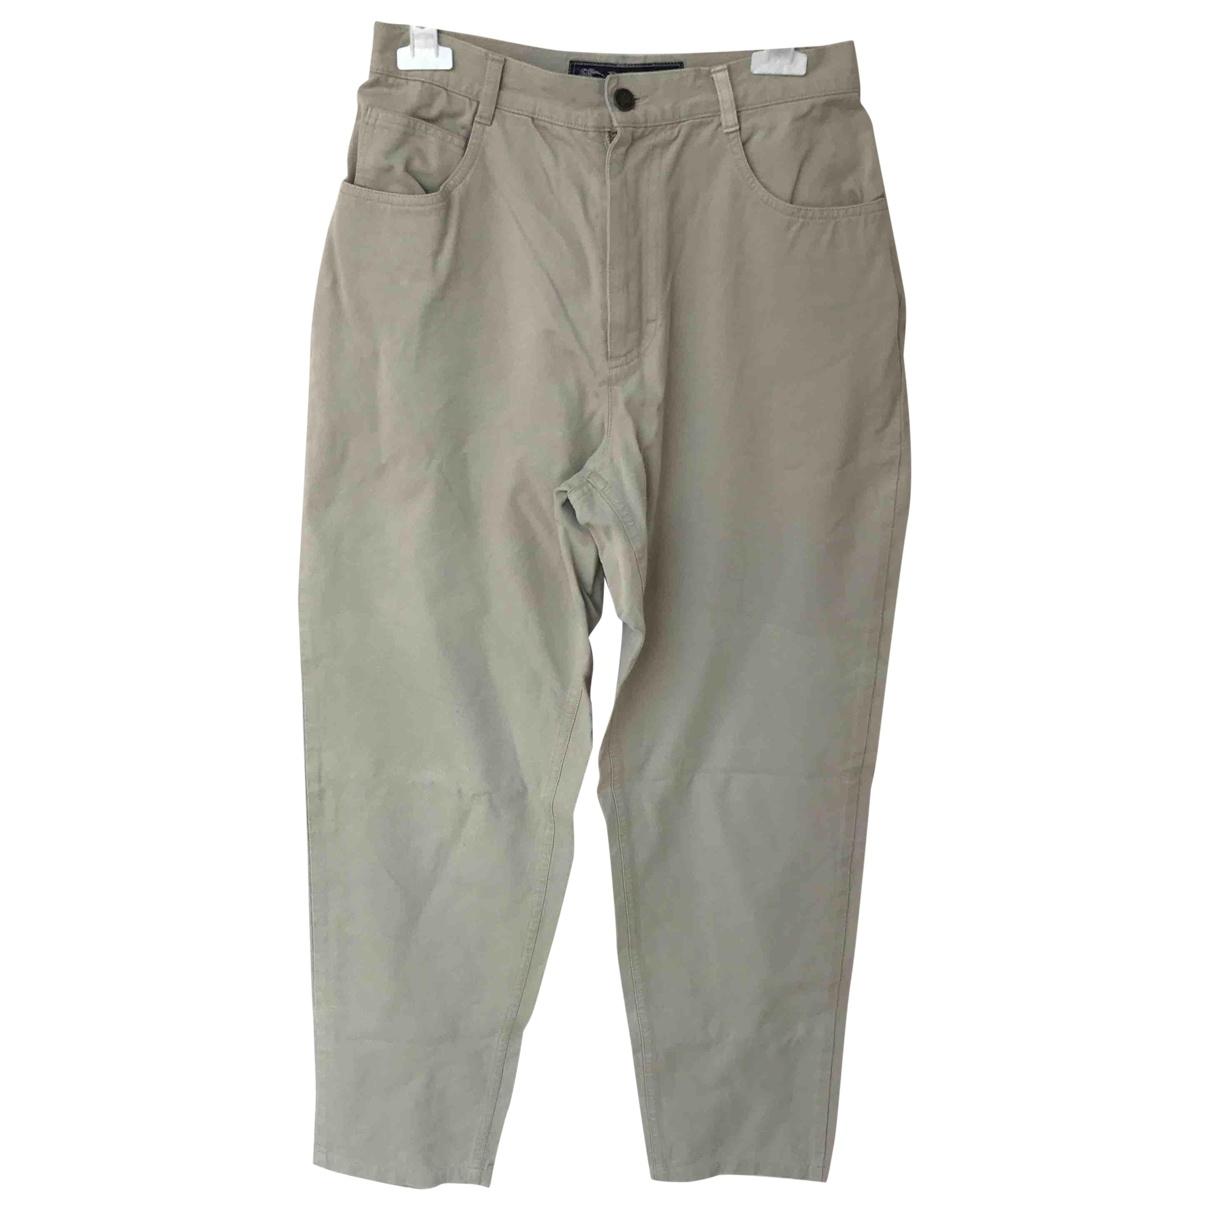 Burberry \N Beige Cotton Trousers for Women 44 IT